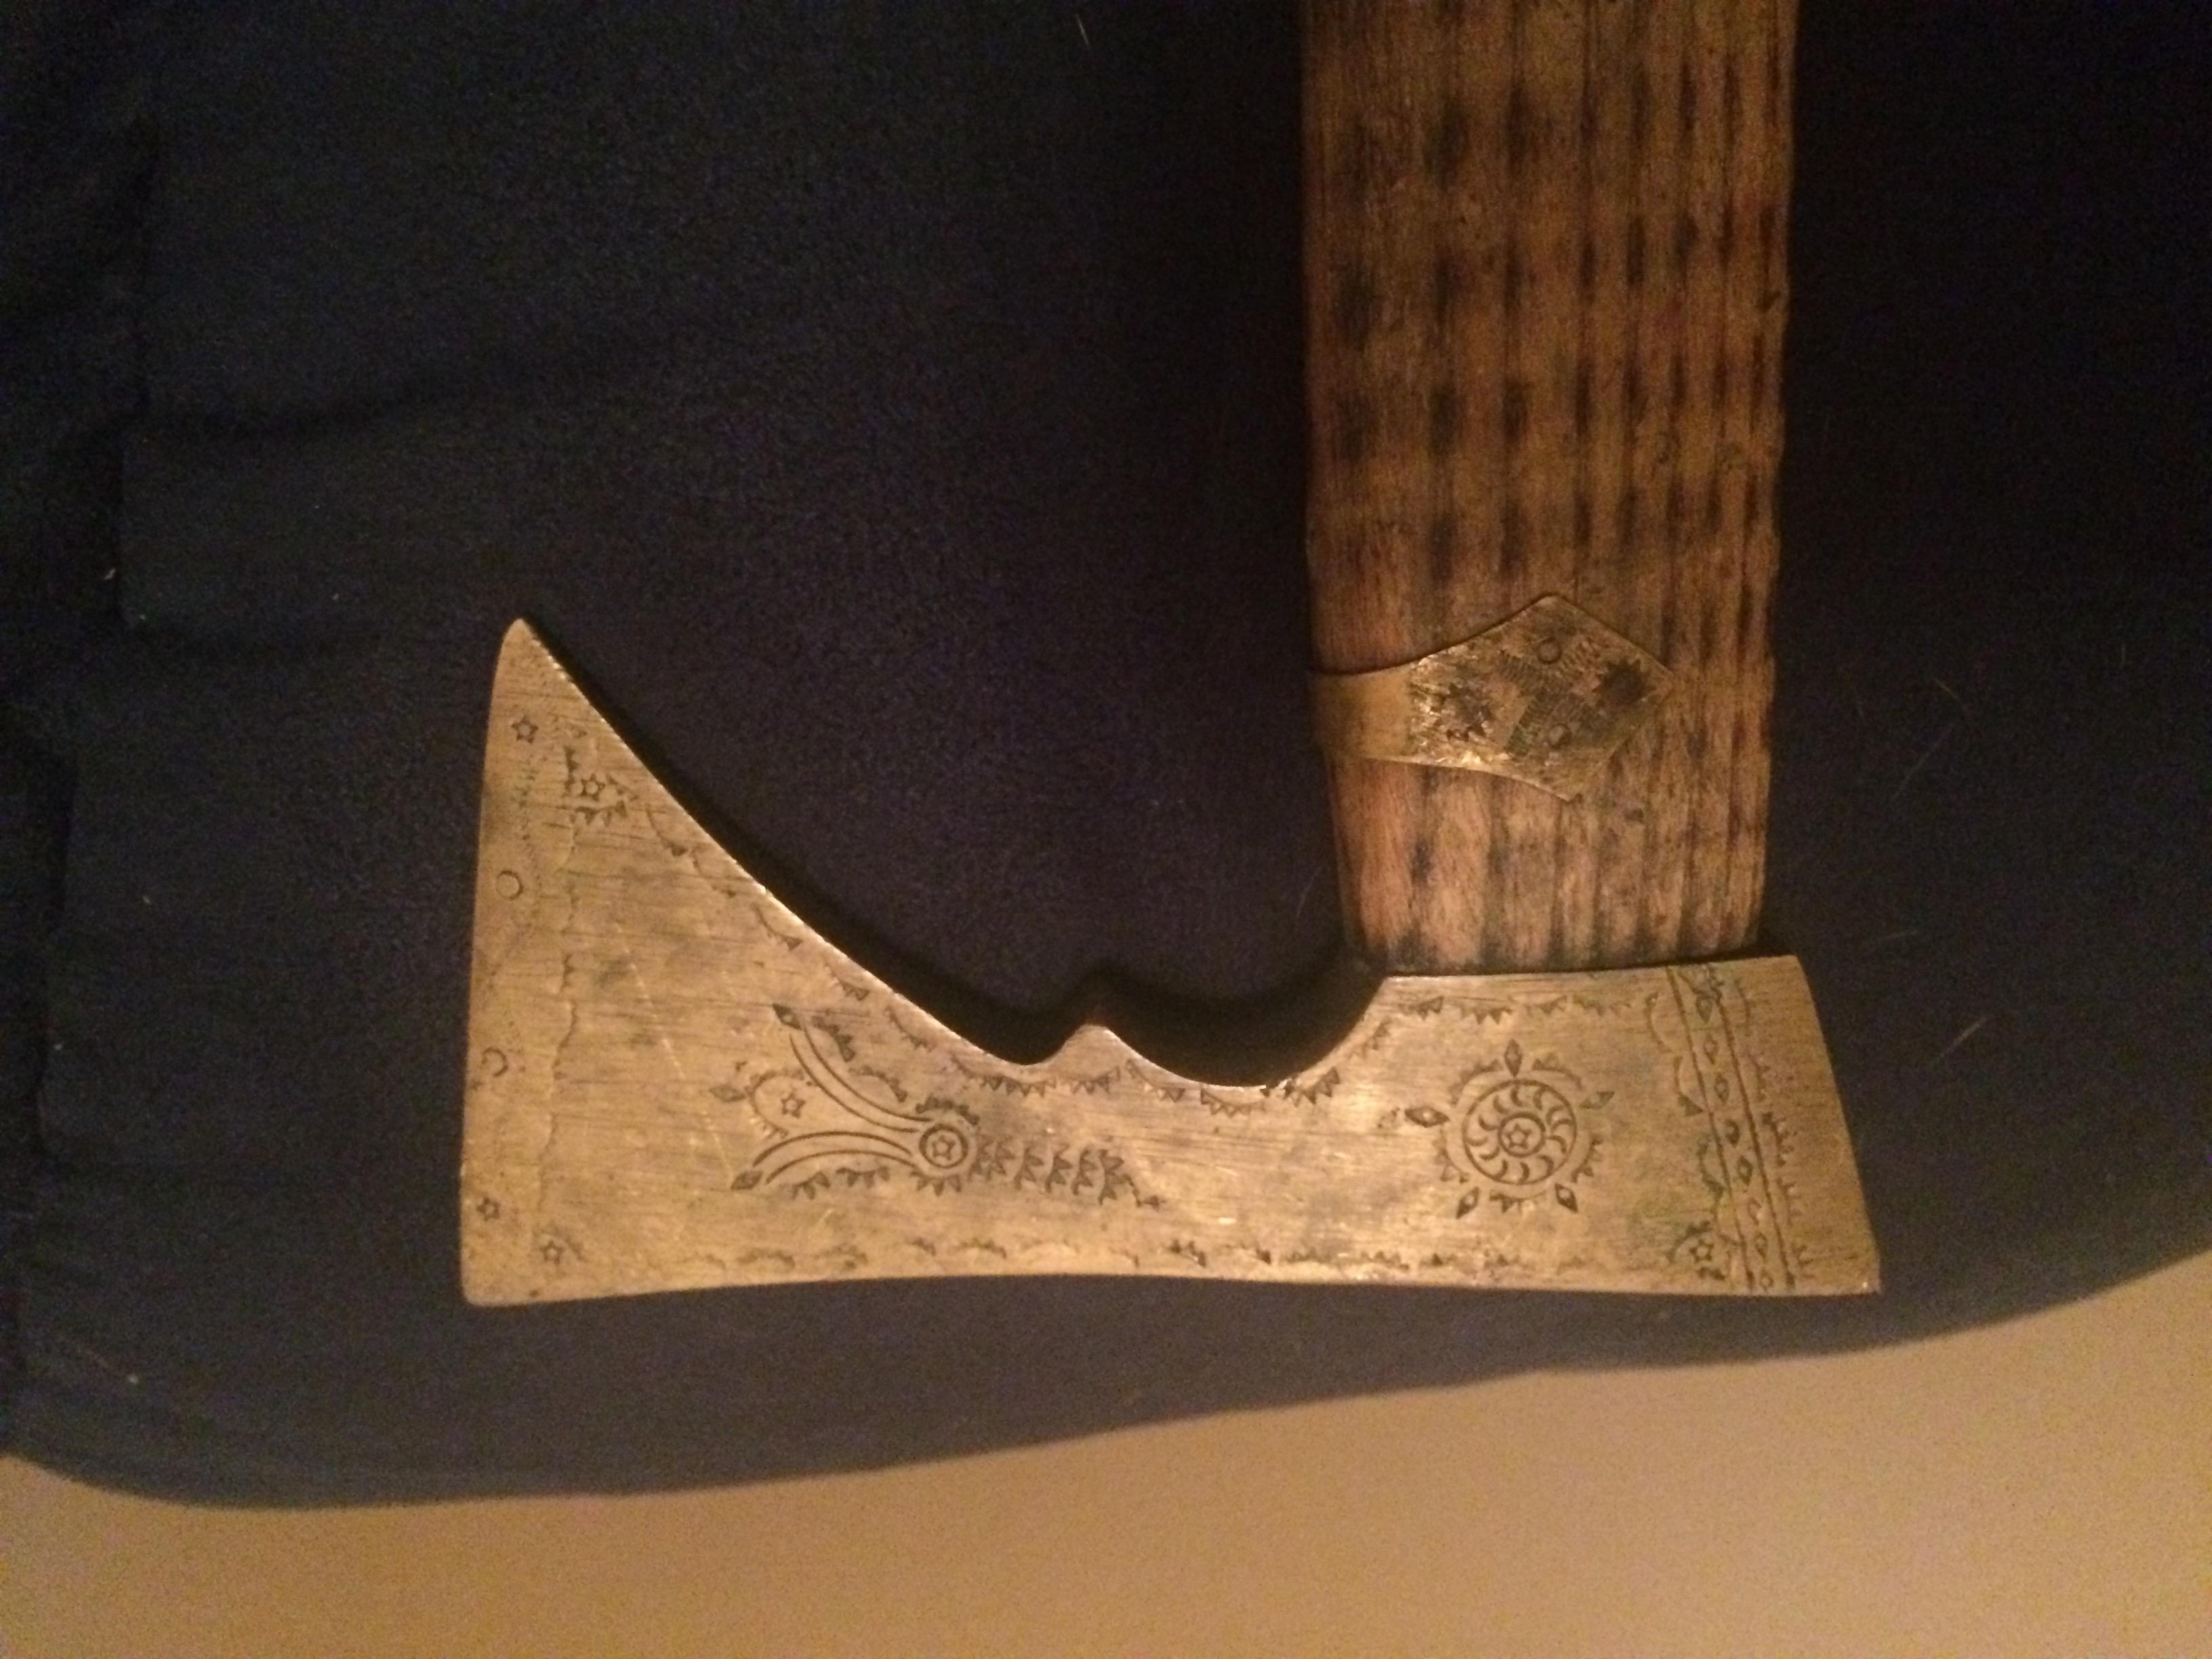 Polish shepherds axe/walking stick ? antique appraisal